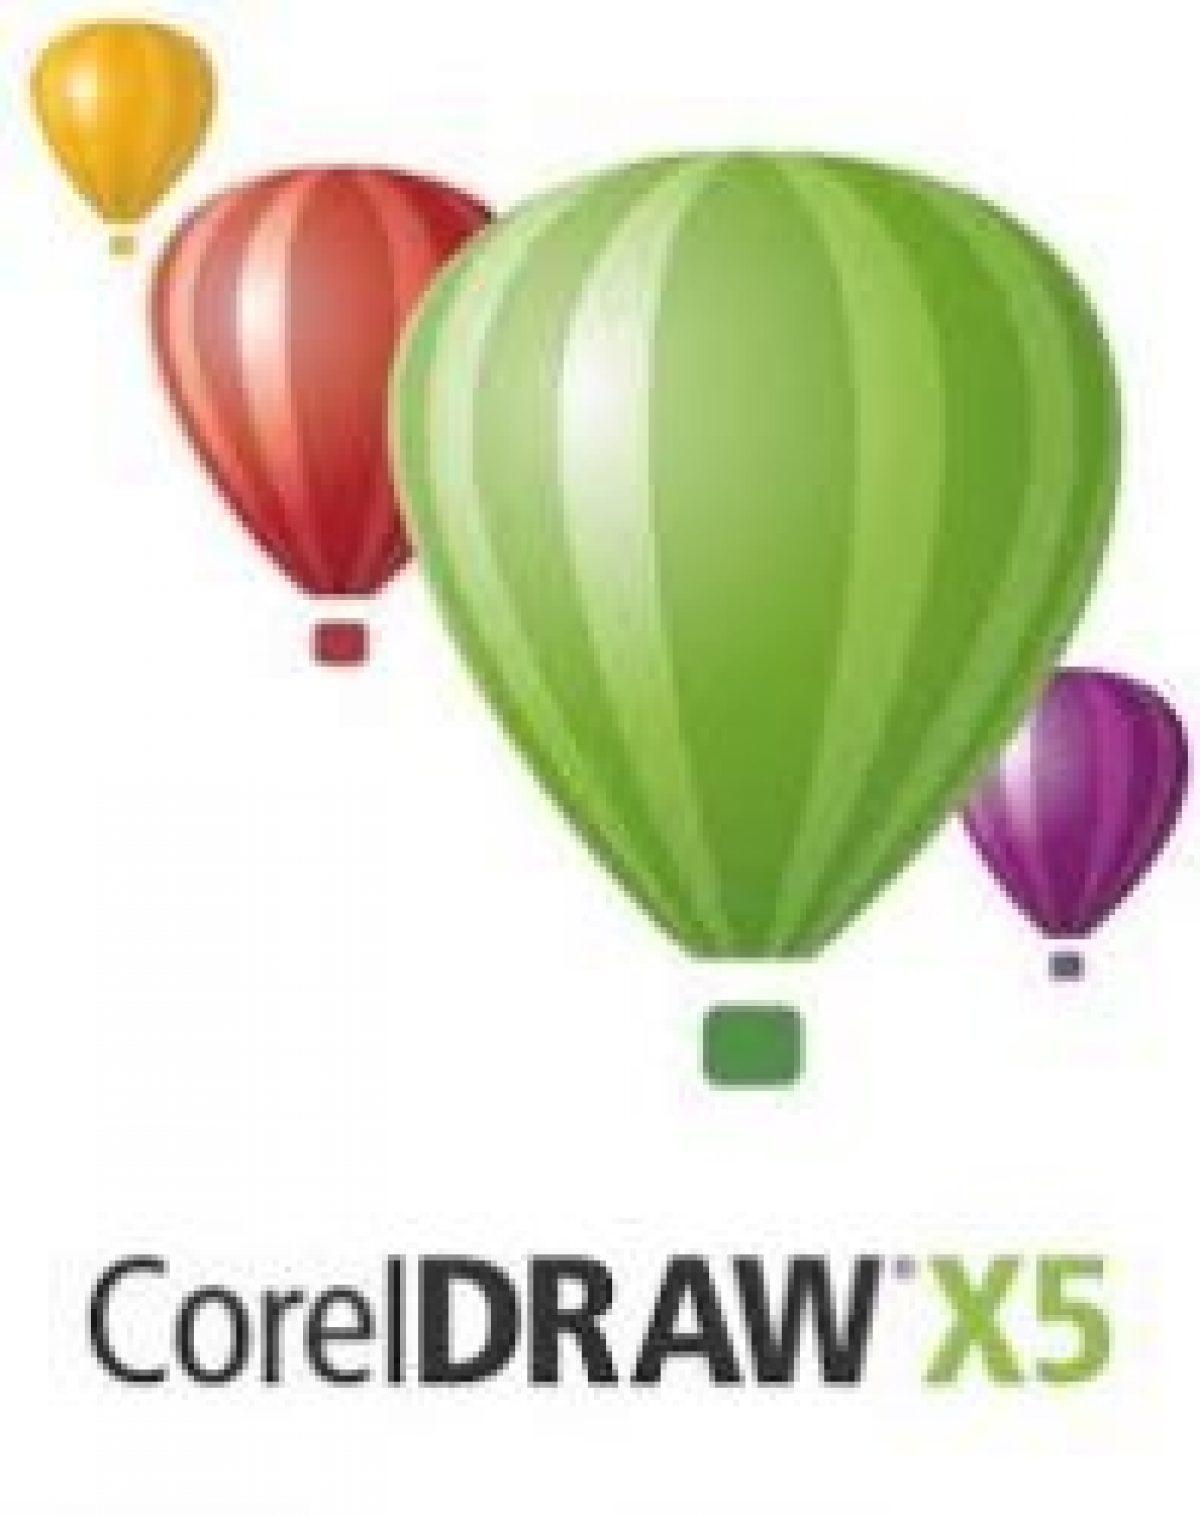 corel-draw-x5-keygen-activation-code-full-free-download-2-1-e1513186515901-1200x1515-3939277